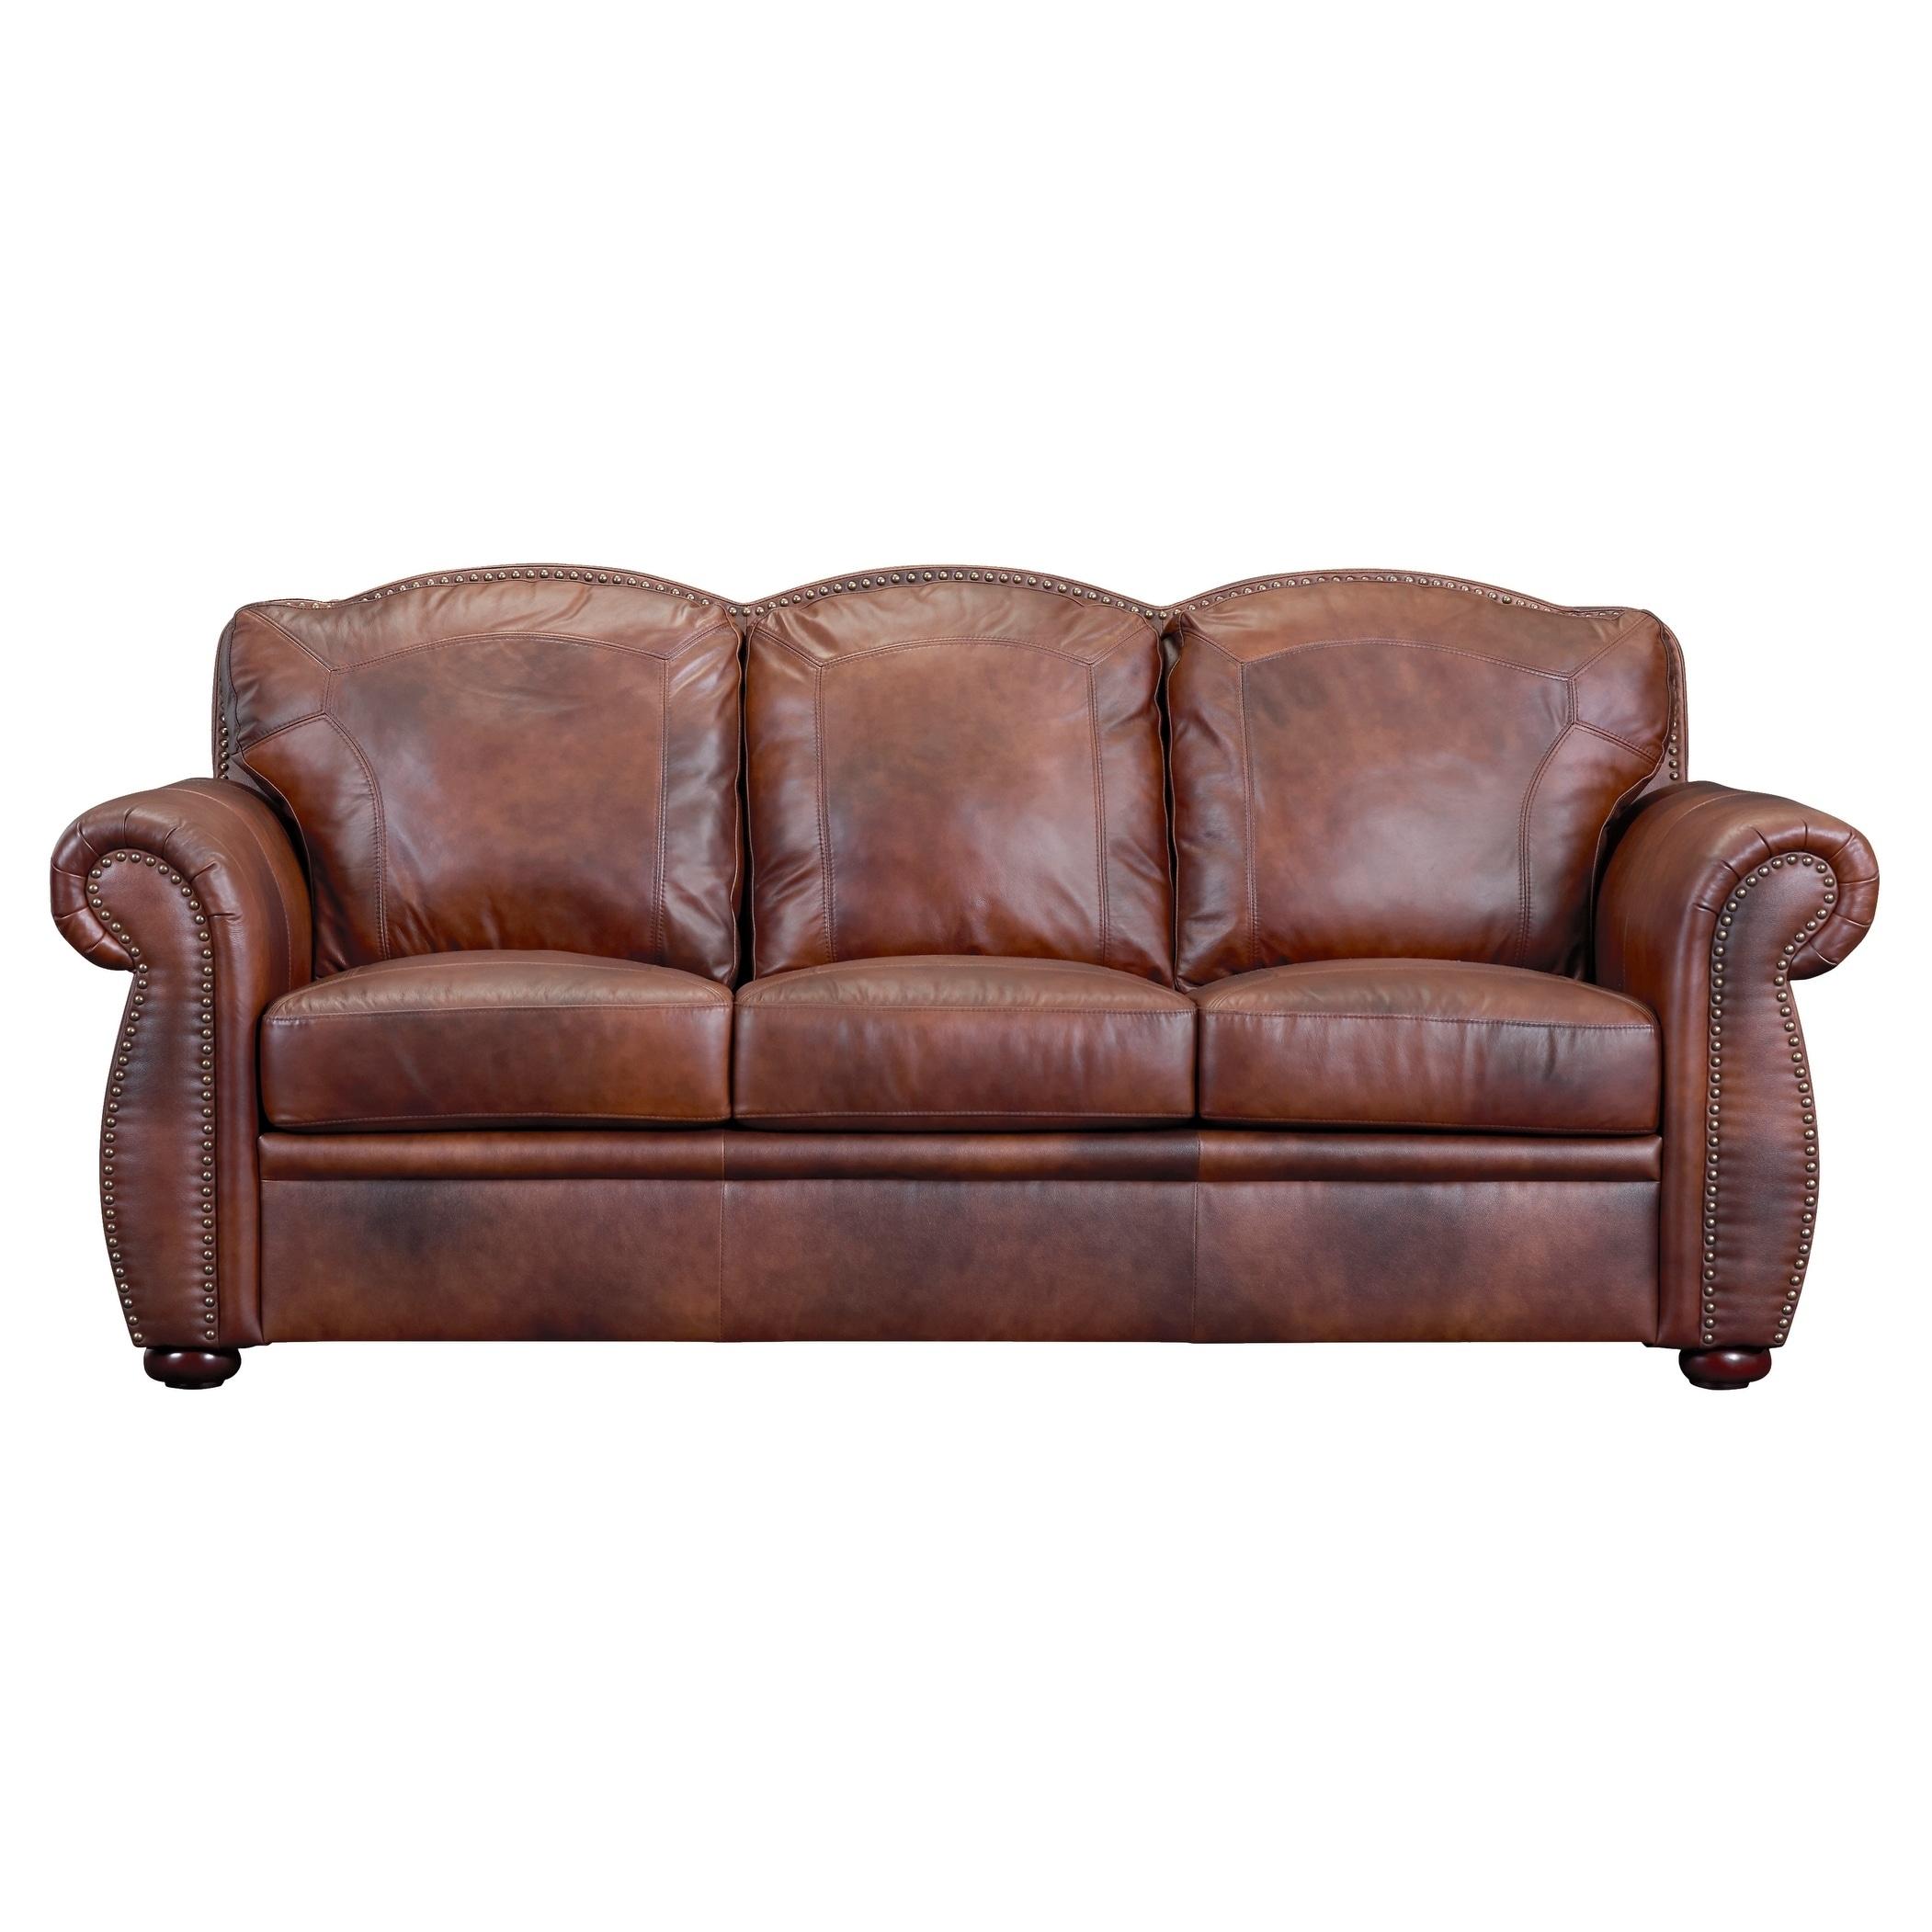 Casey Top Grain Italian Leather Sofa Free Shipping Today 18008091